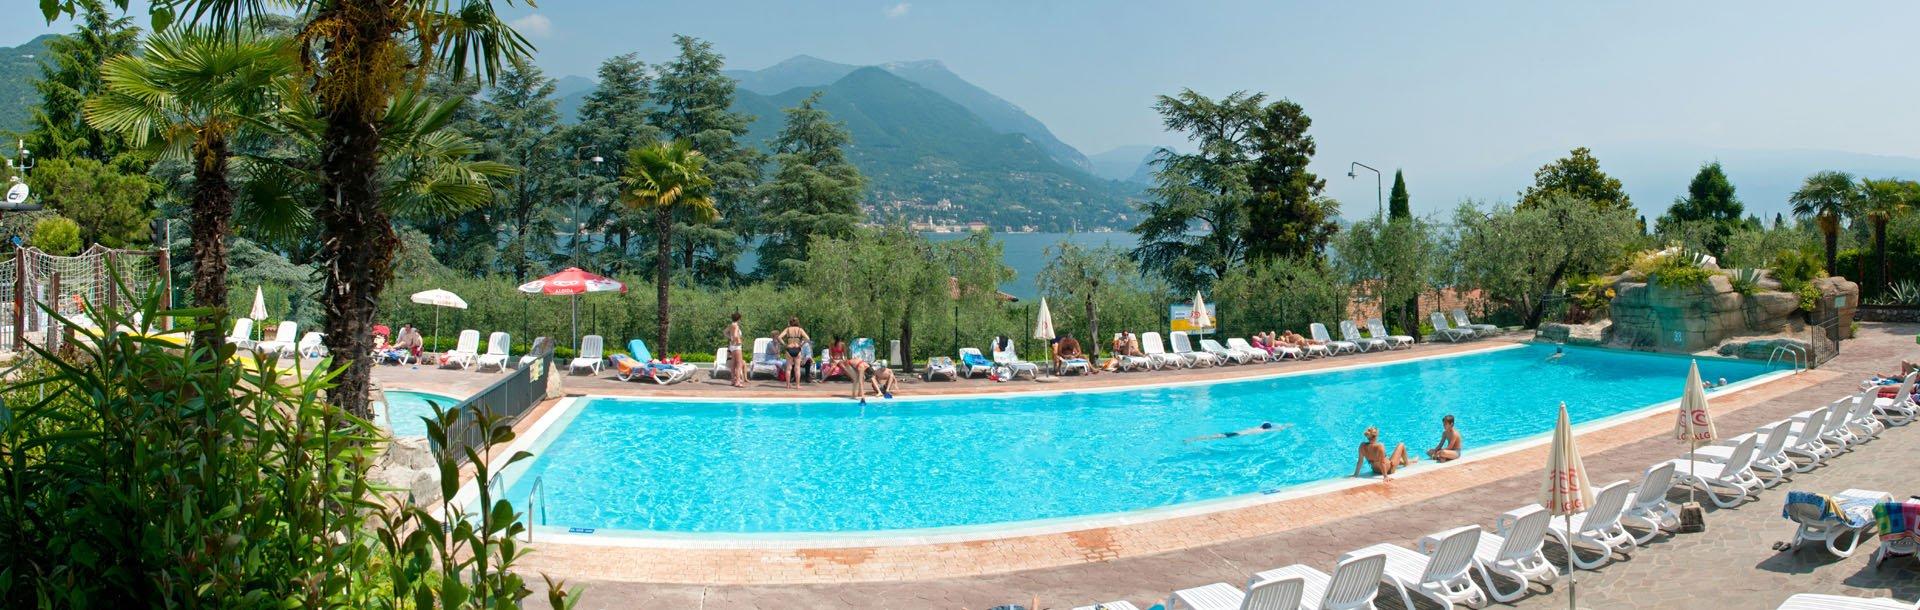 Villagio Eden, Lago di Garda, Italia